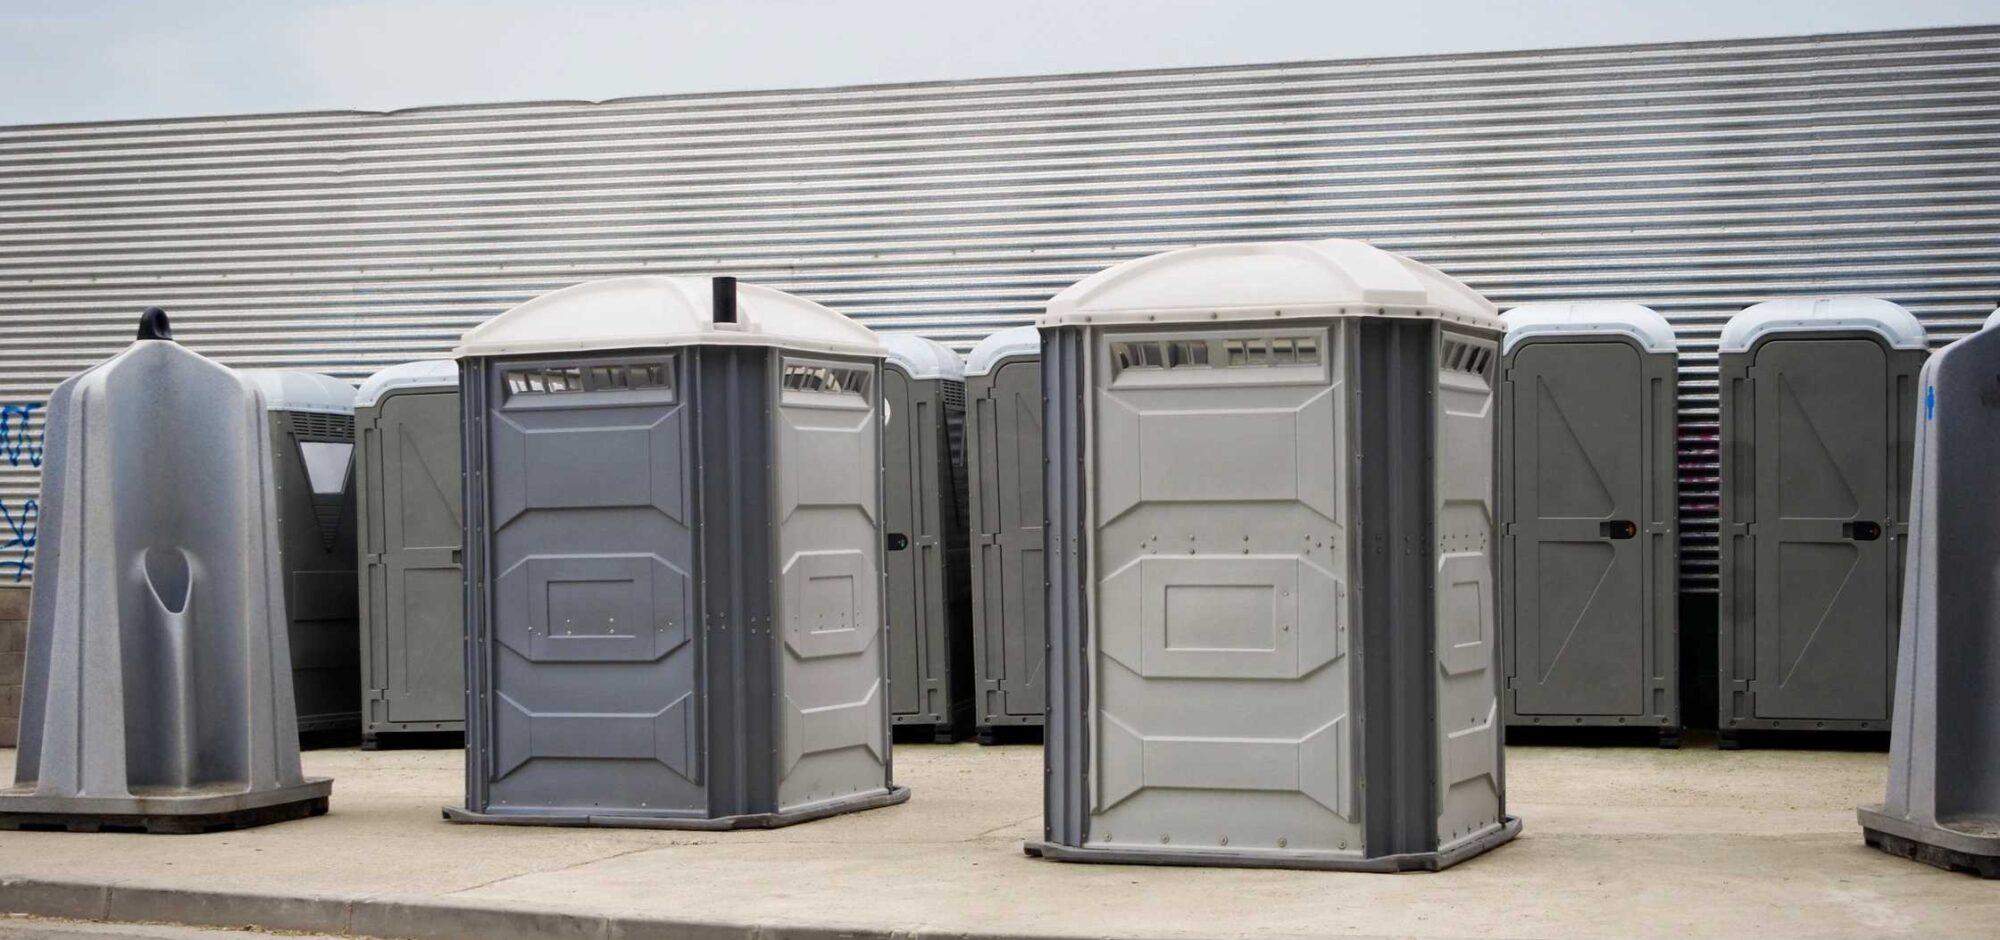 Affordable Porta Potty Services, Affordable LLC